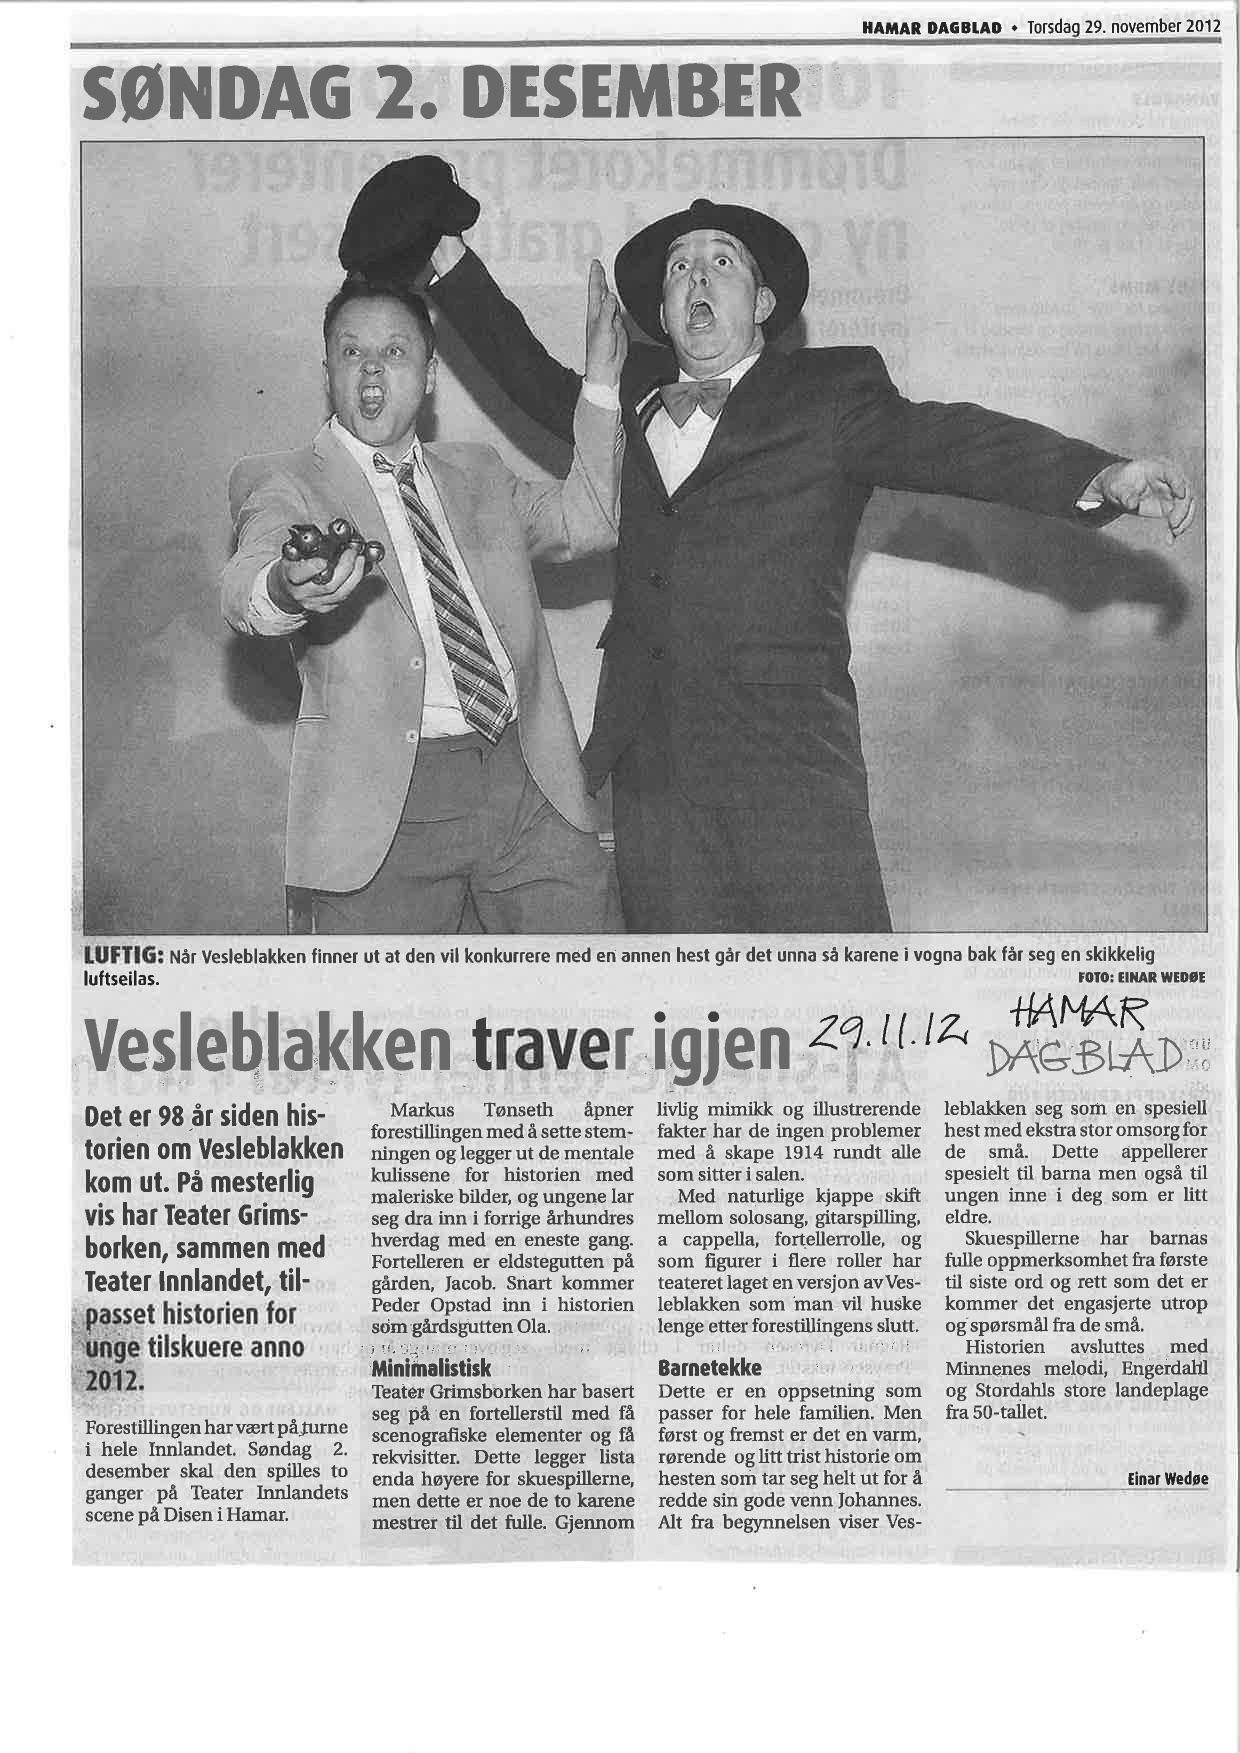 Nov 29 2012 Hamar Dagblad.jpg